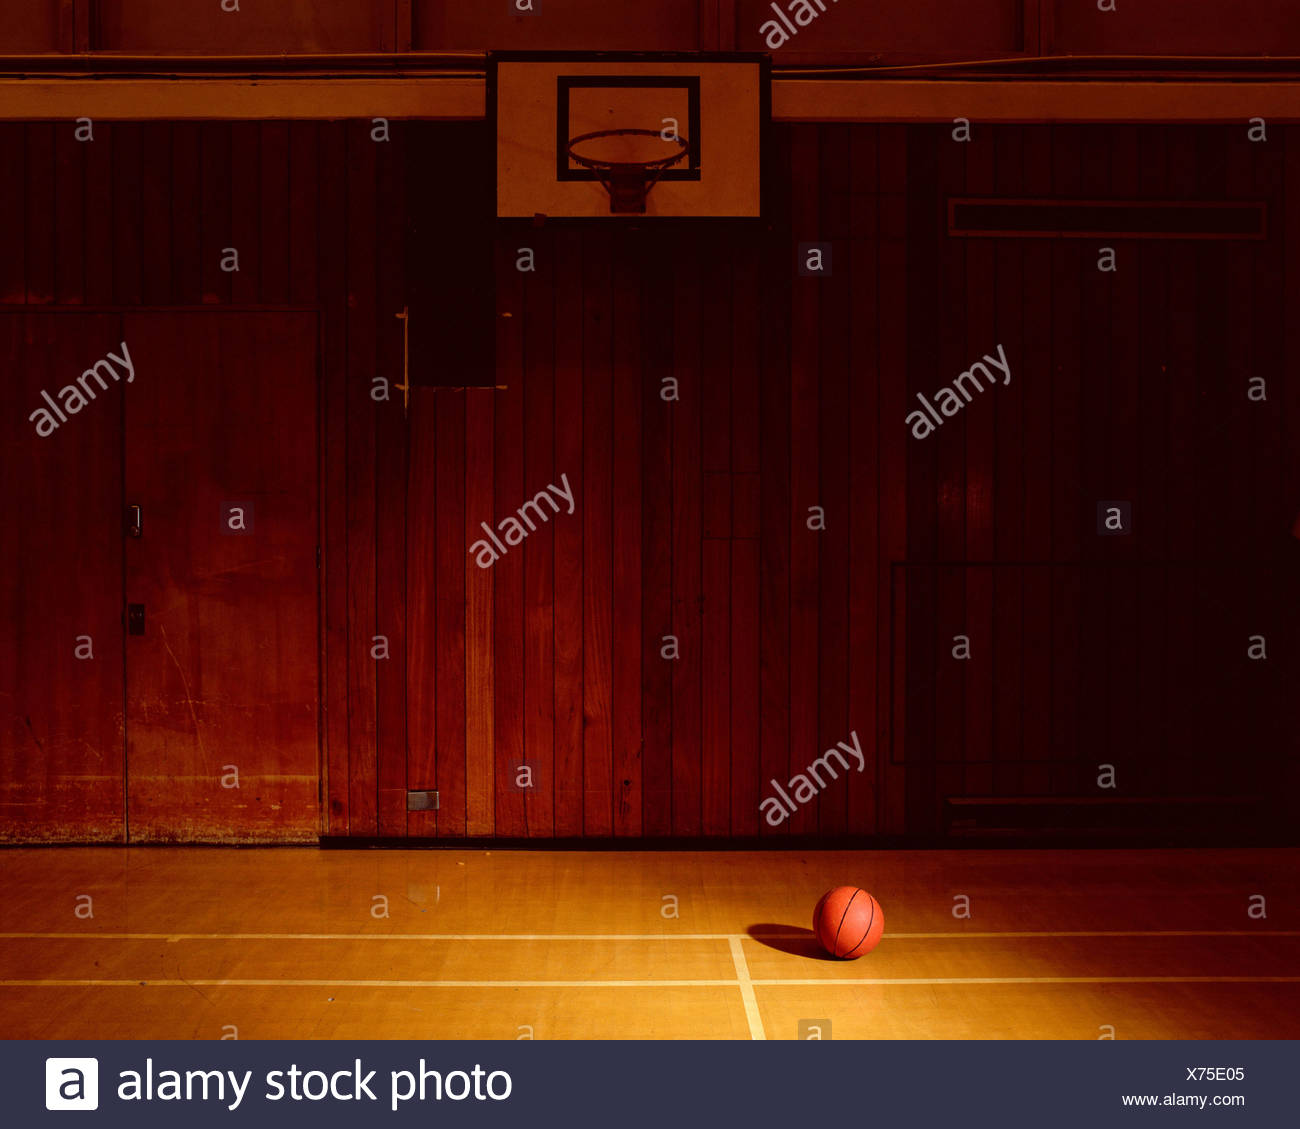 Cancha de baloncesto vacía Imagen De Stock